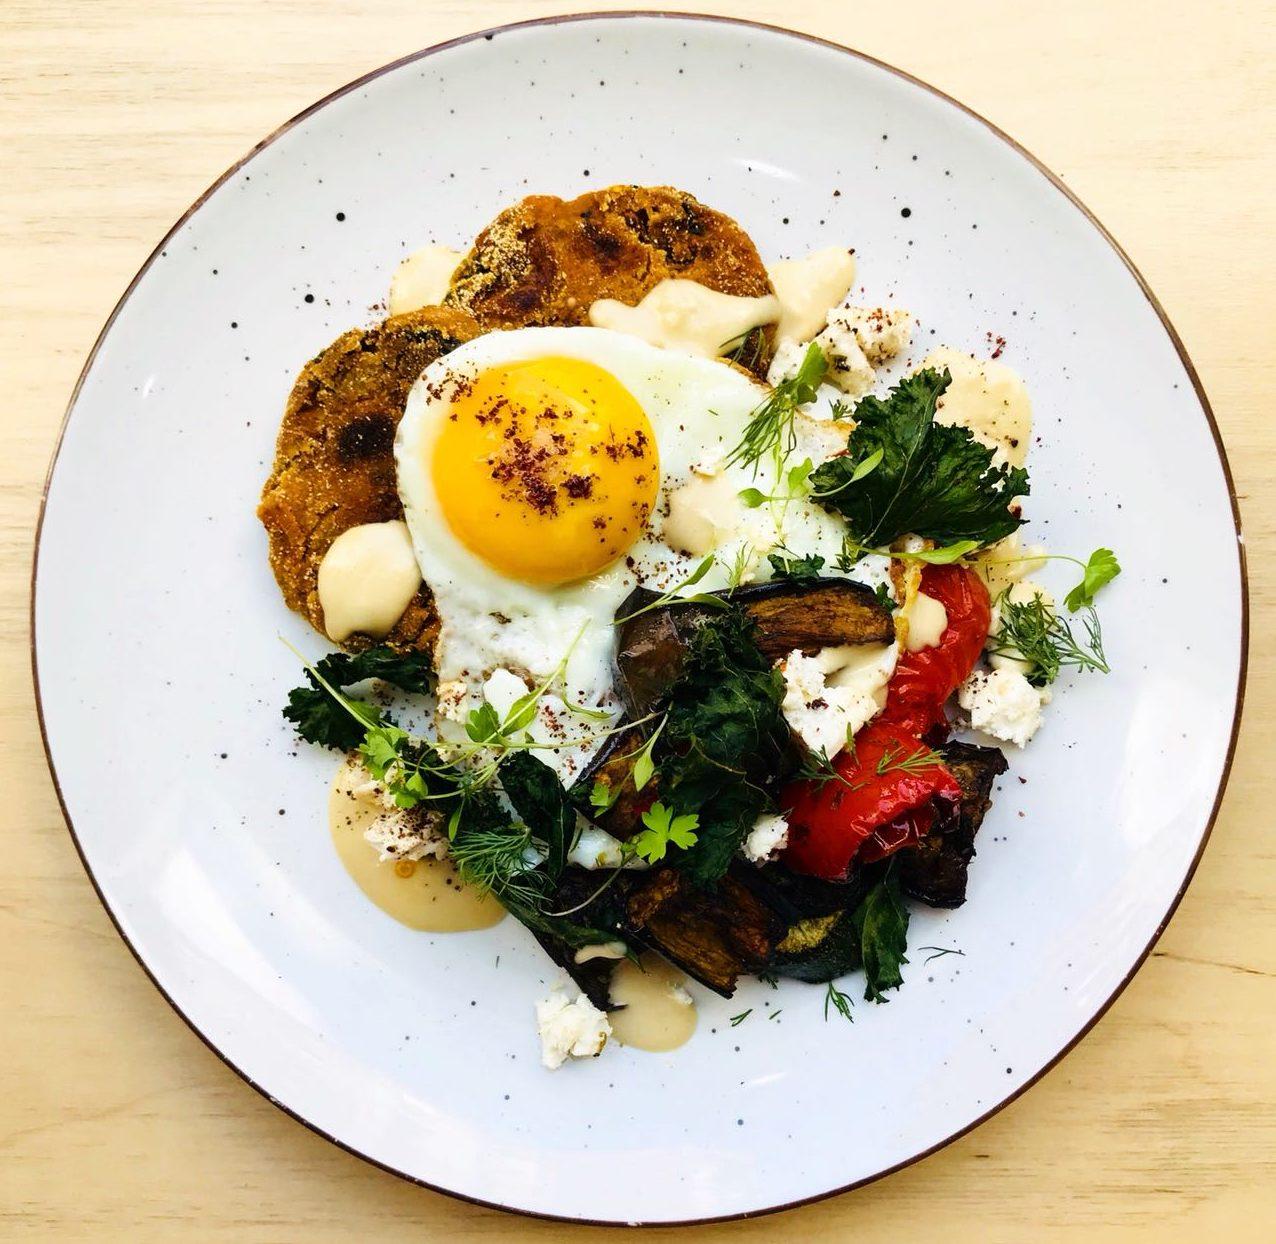 Izy Hossack – Falafel Spiced Sweet Potato and Egg Breakfast